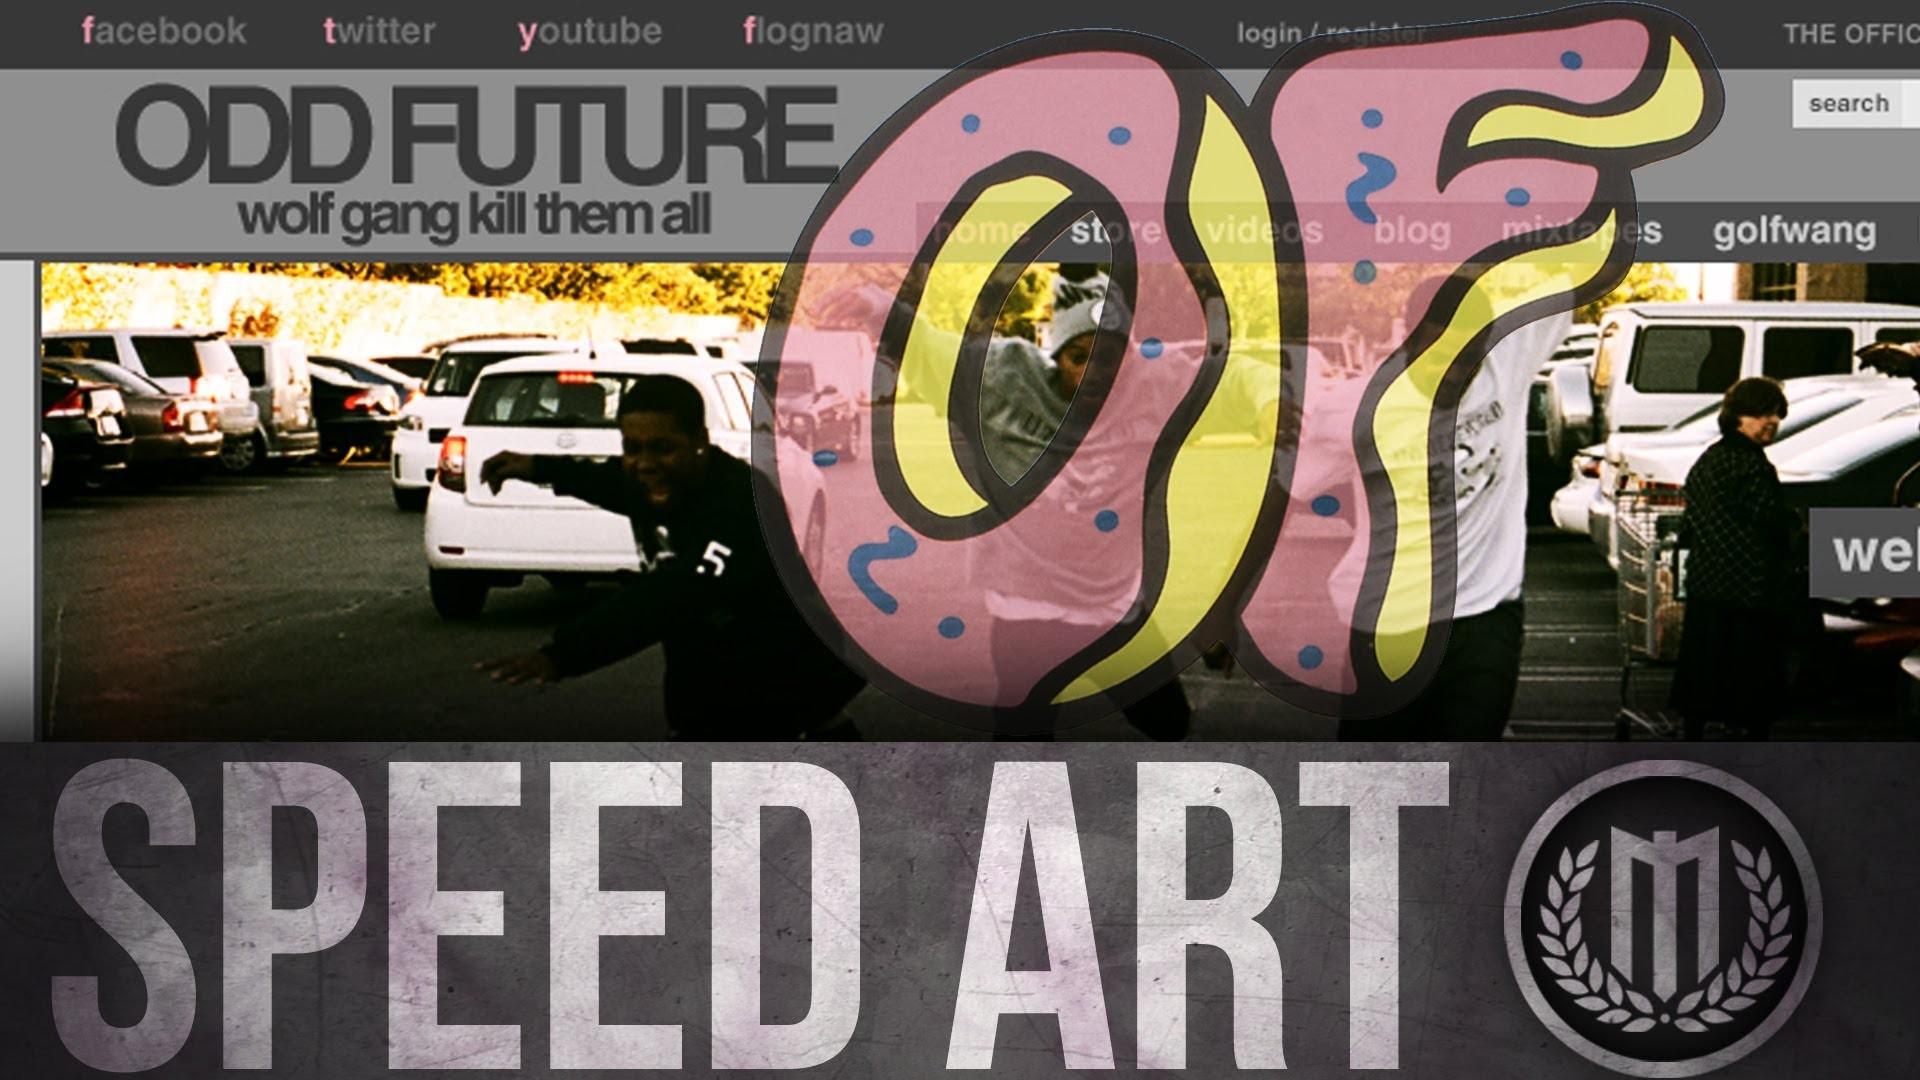 Odd Future Web-Design ( #Photoshop )